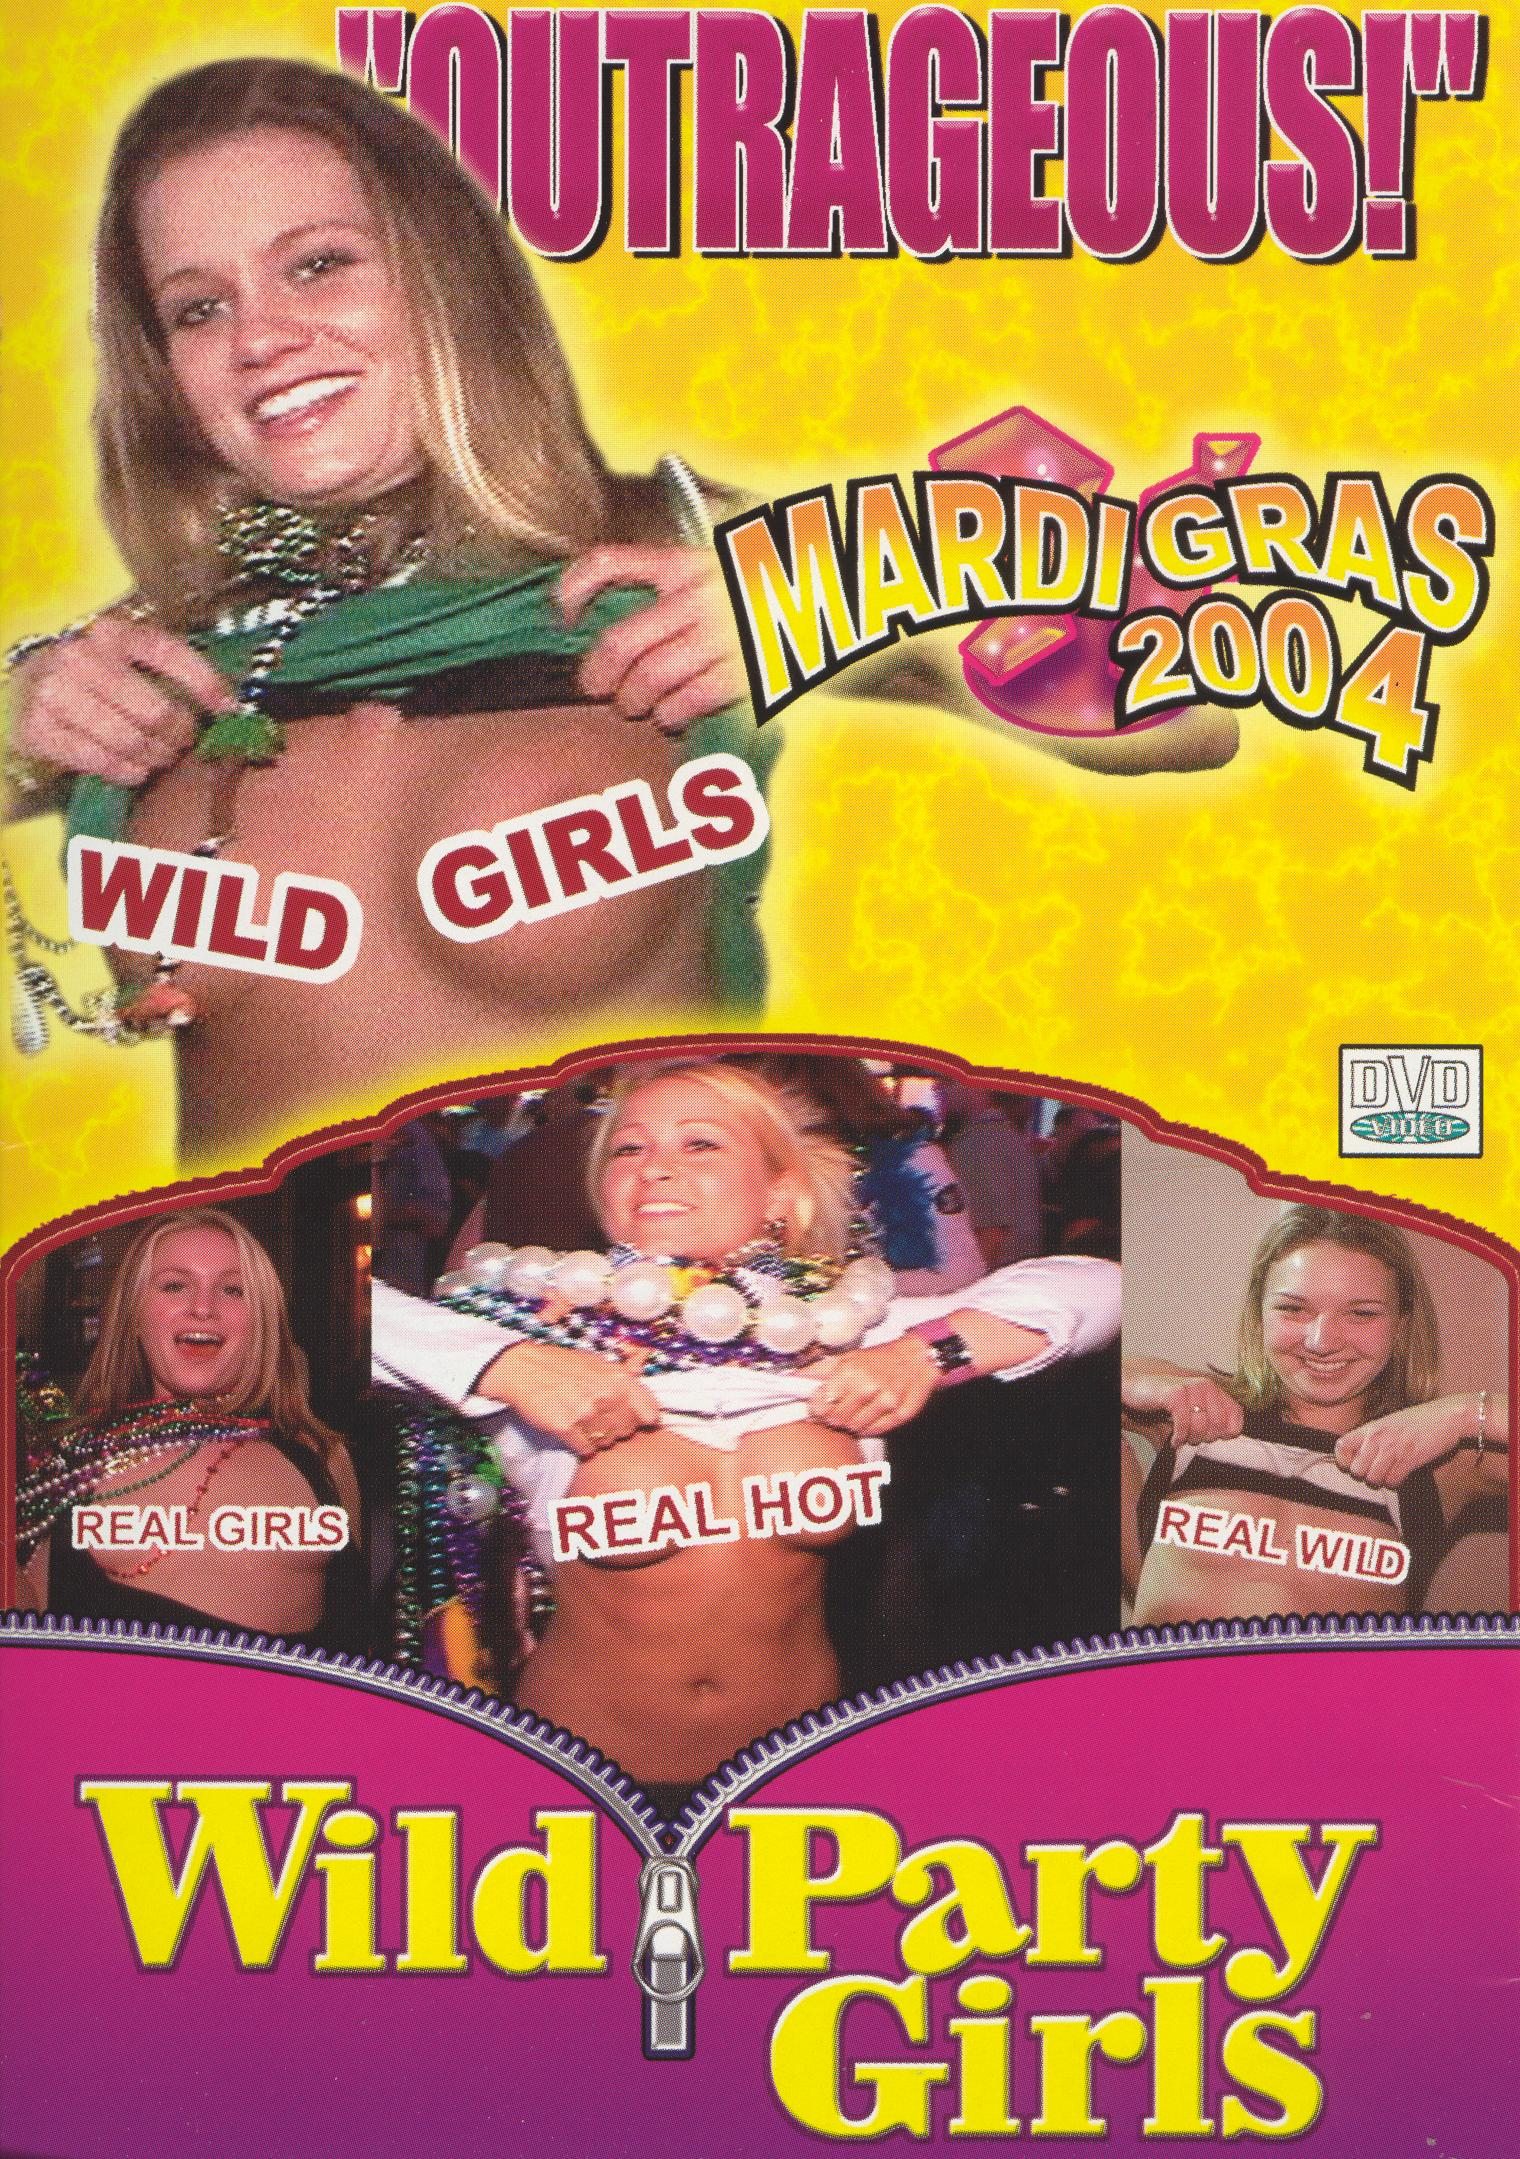 Wild Party Girls: Mardi Gras